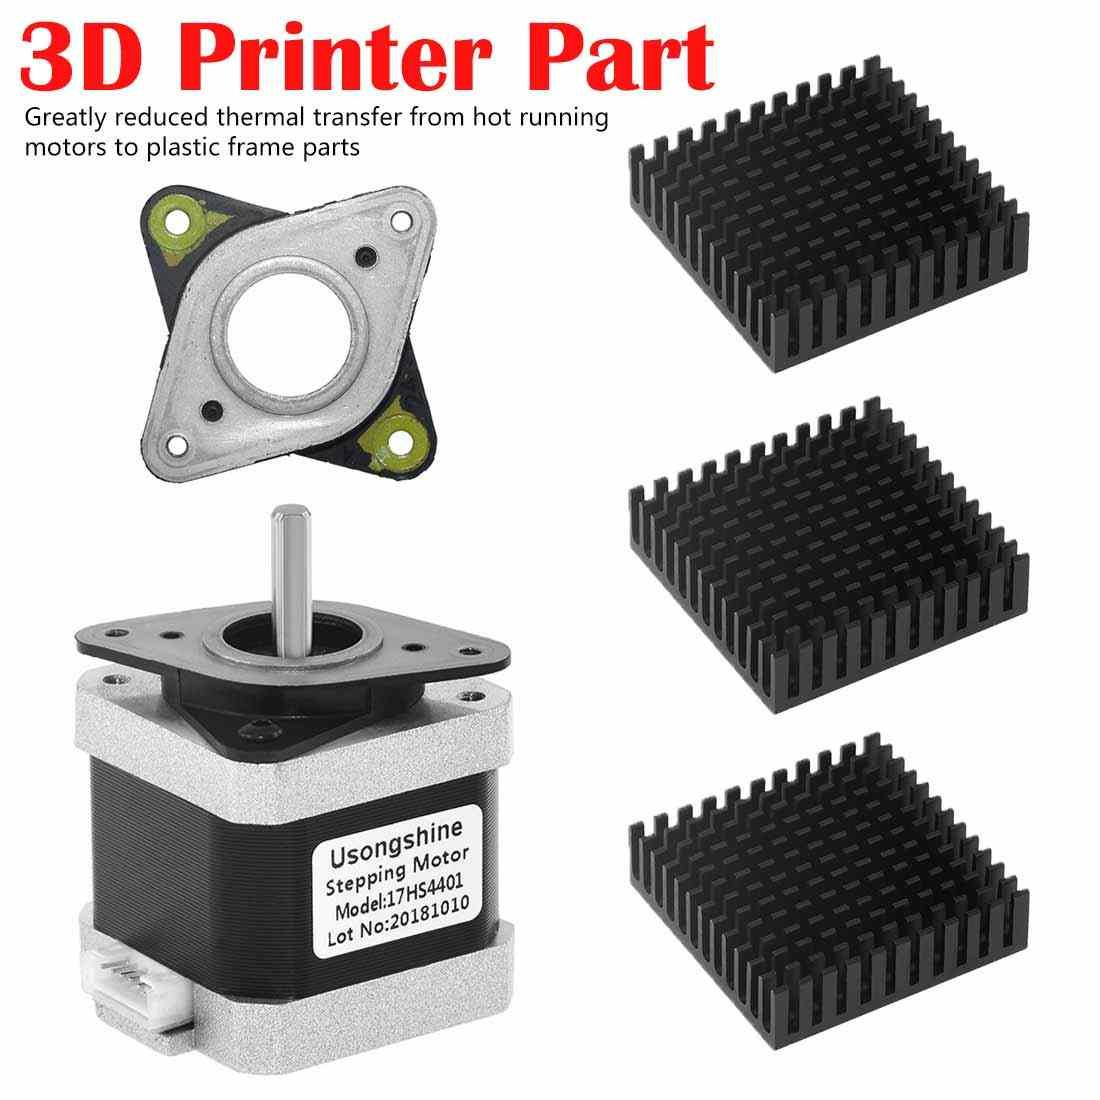 17 Stepper Damper Gasket Isolator Stepper Motor Peredam Getaran 42 Motor Absorber untuk 3D Printer Motor